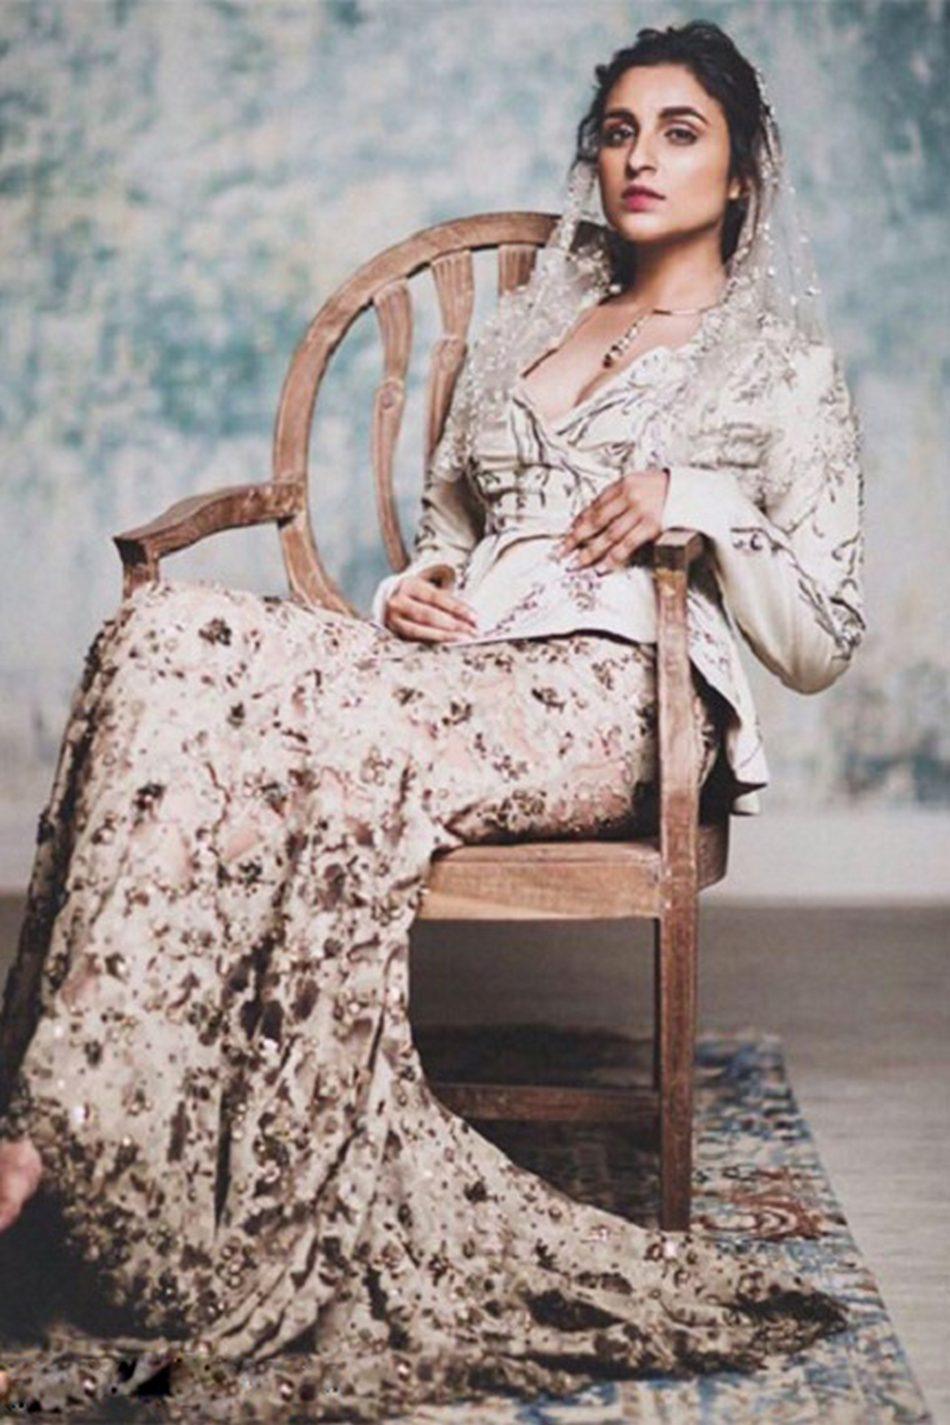 parineeti chopra hot photo shoot for bazaar bride magazine hd photos